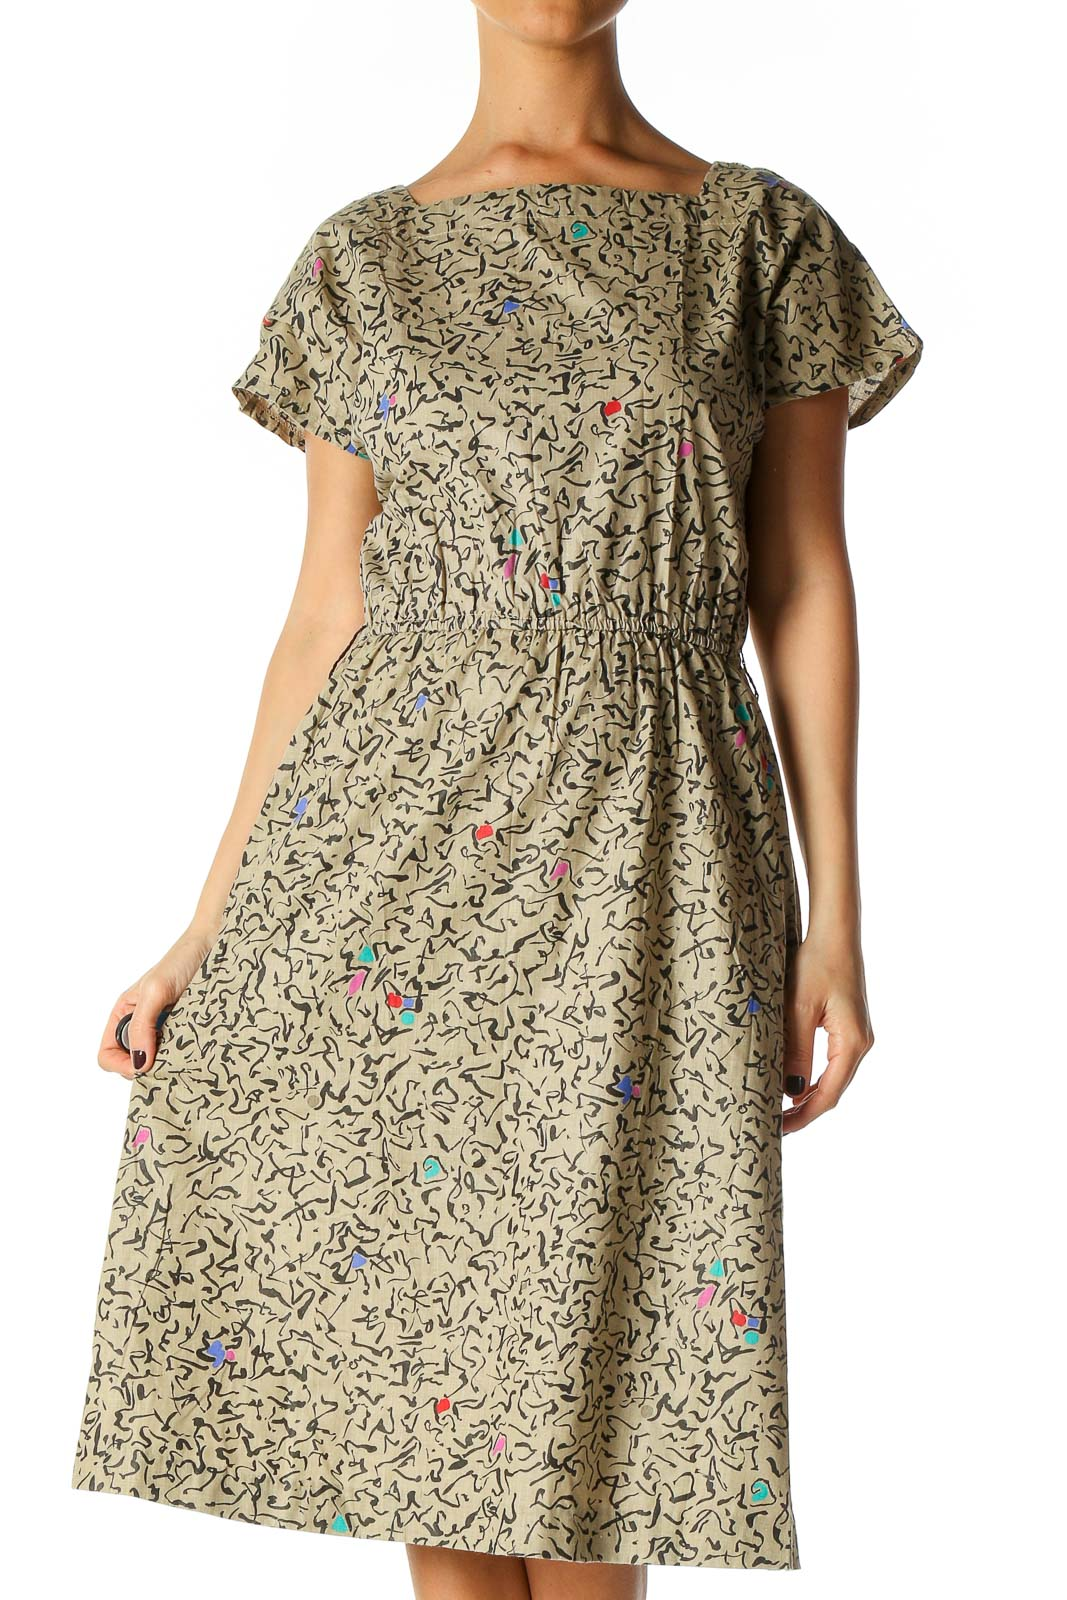 Beige Geometric Print Retro Fit & Flare Dress Front